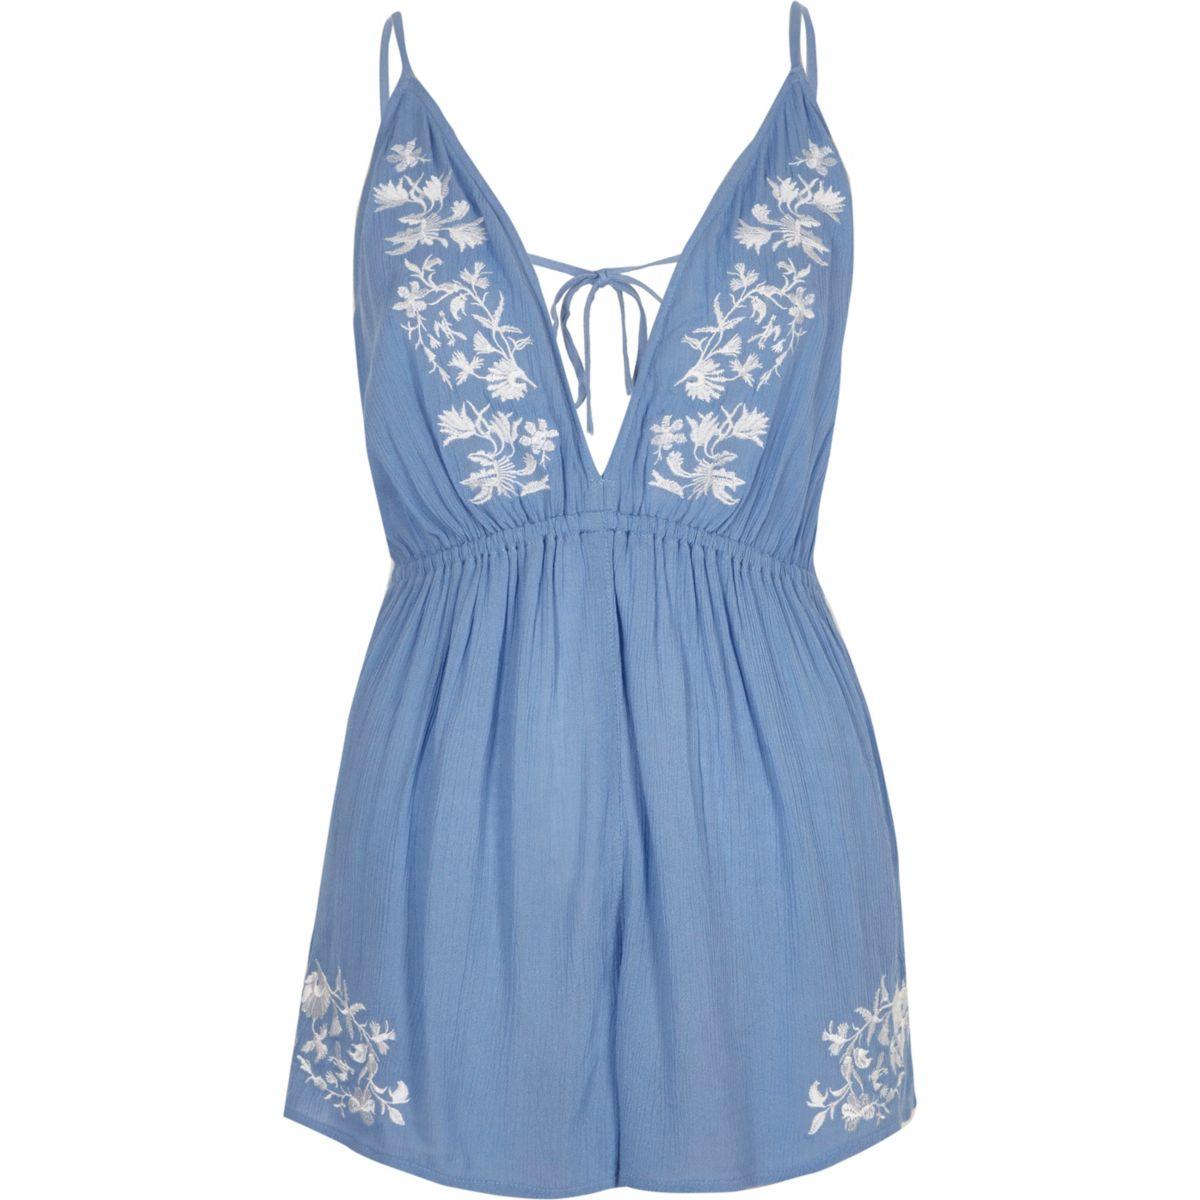 Blue floral embroidered romper